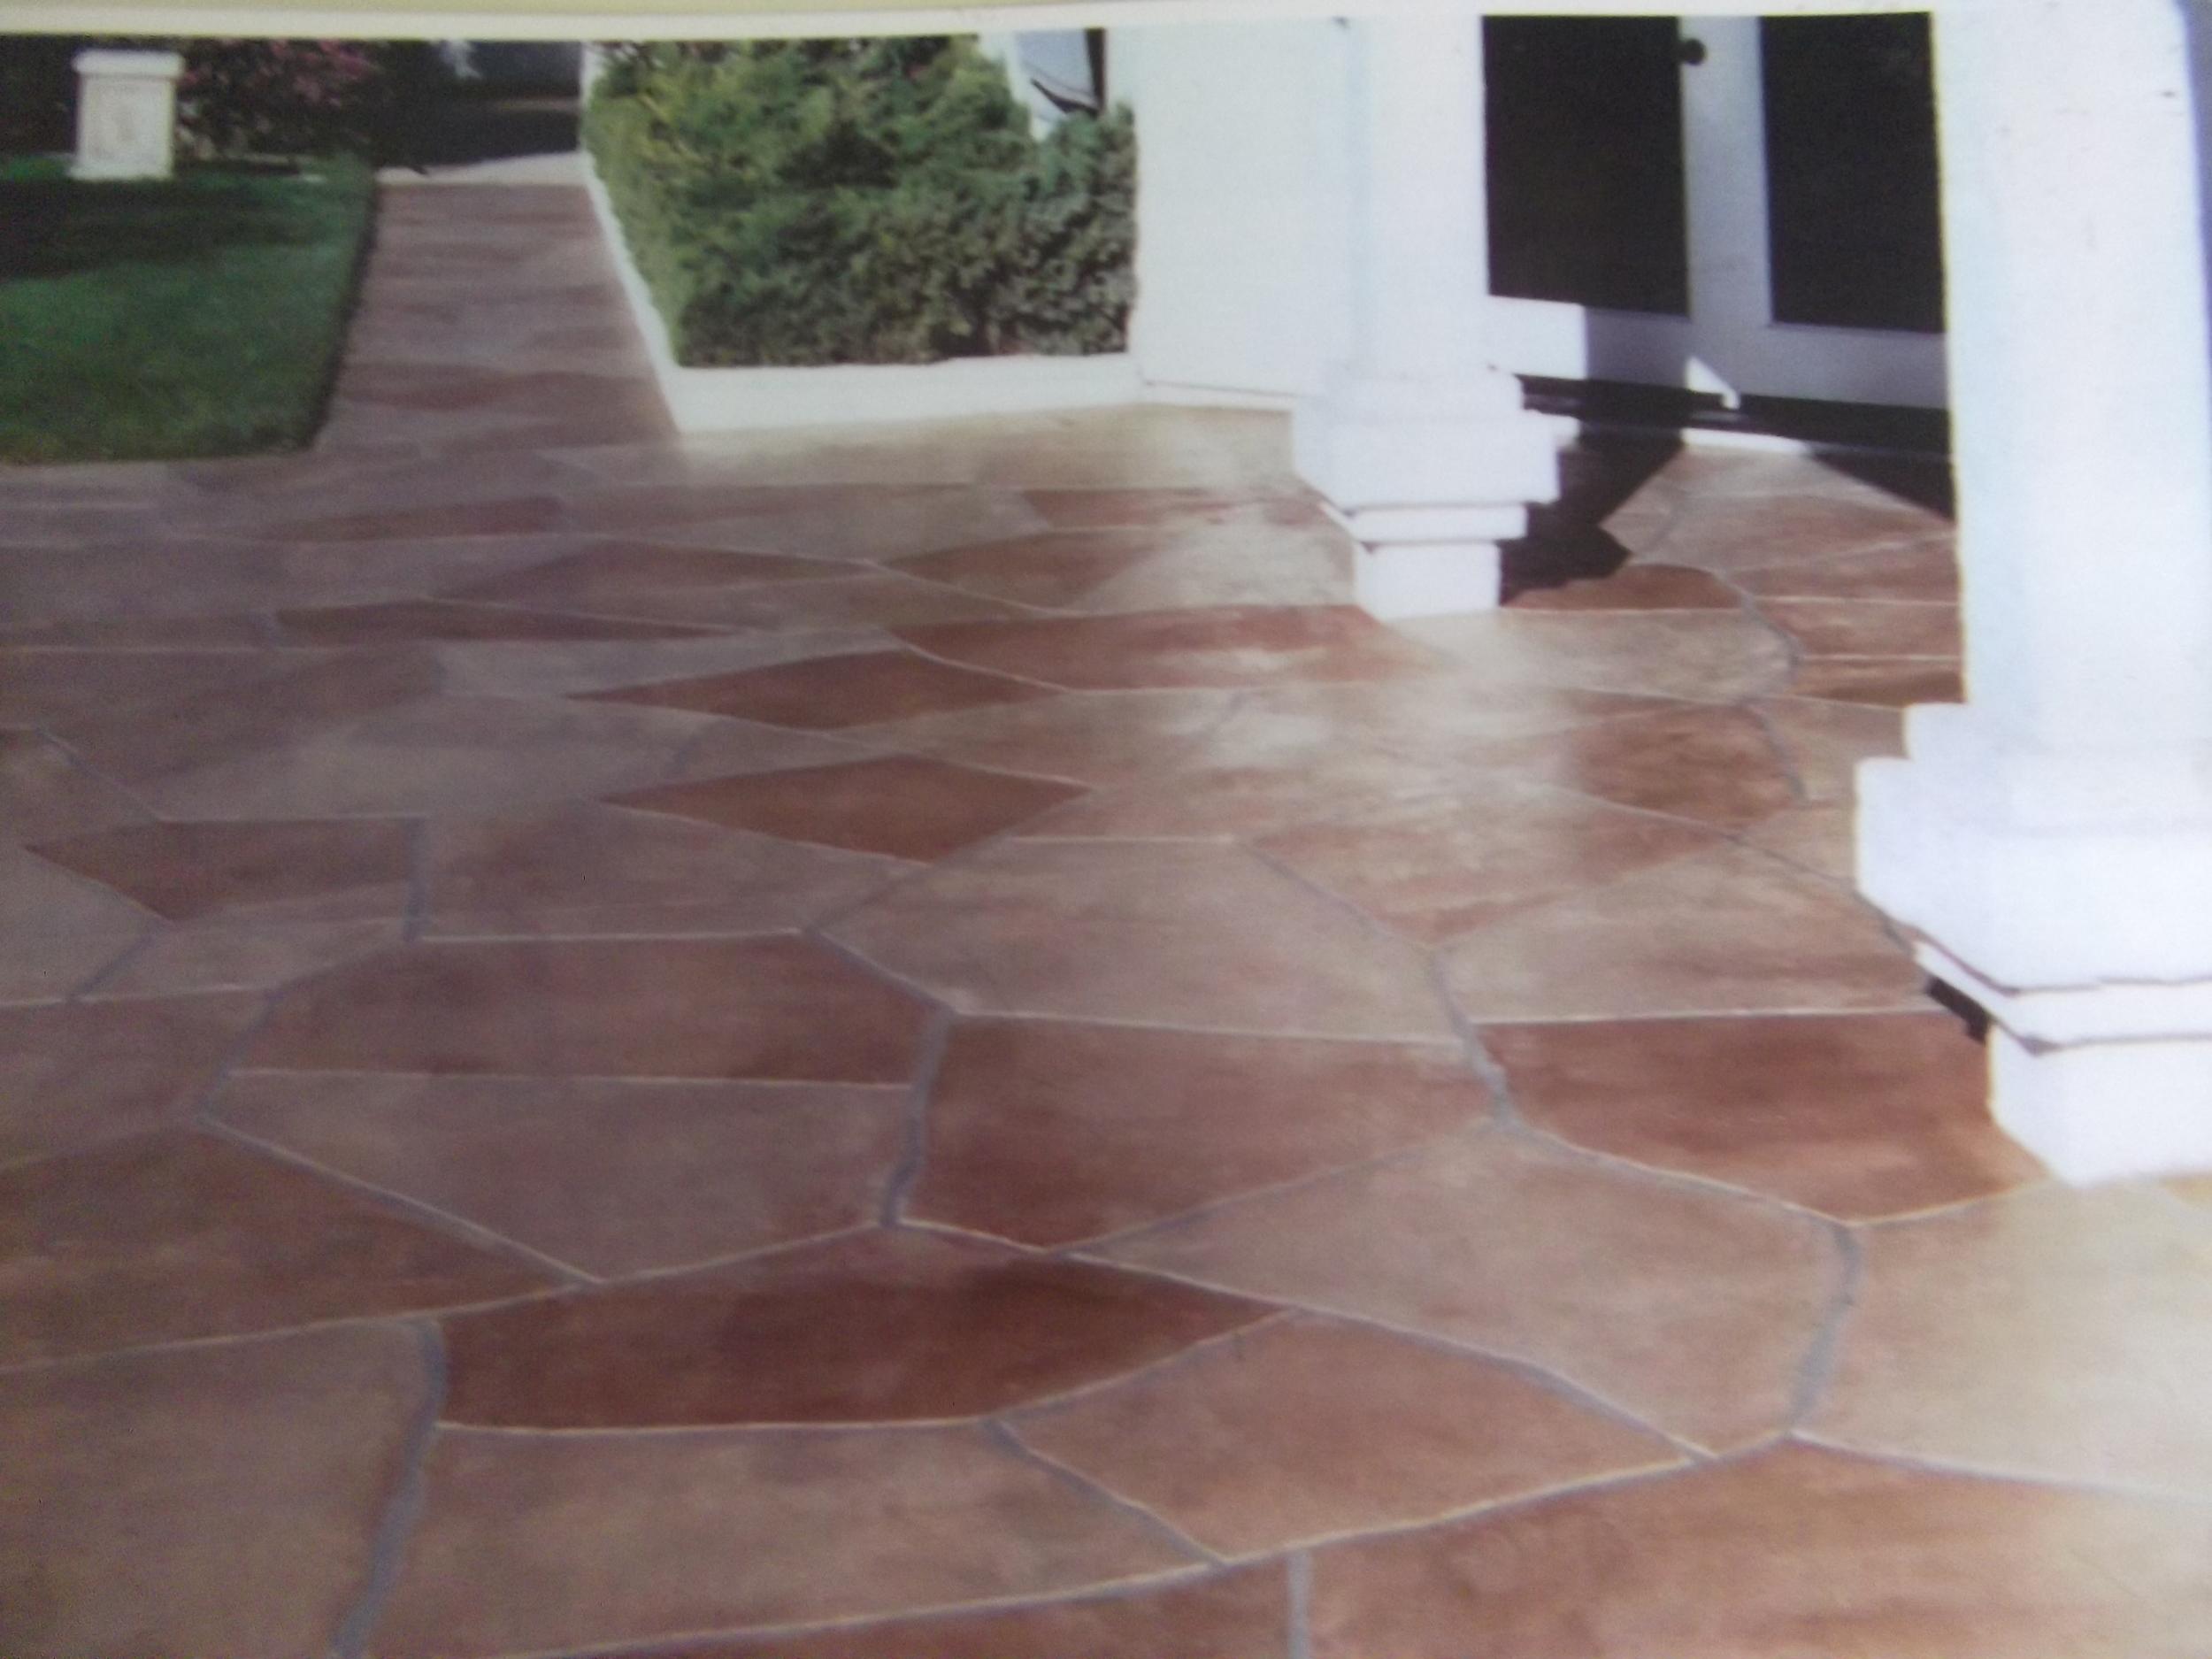 Spanish Brown flagstone patio in Nipomo